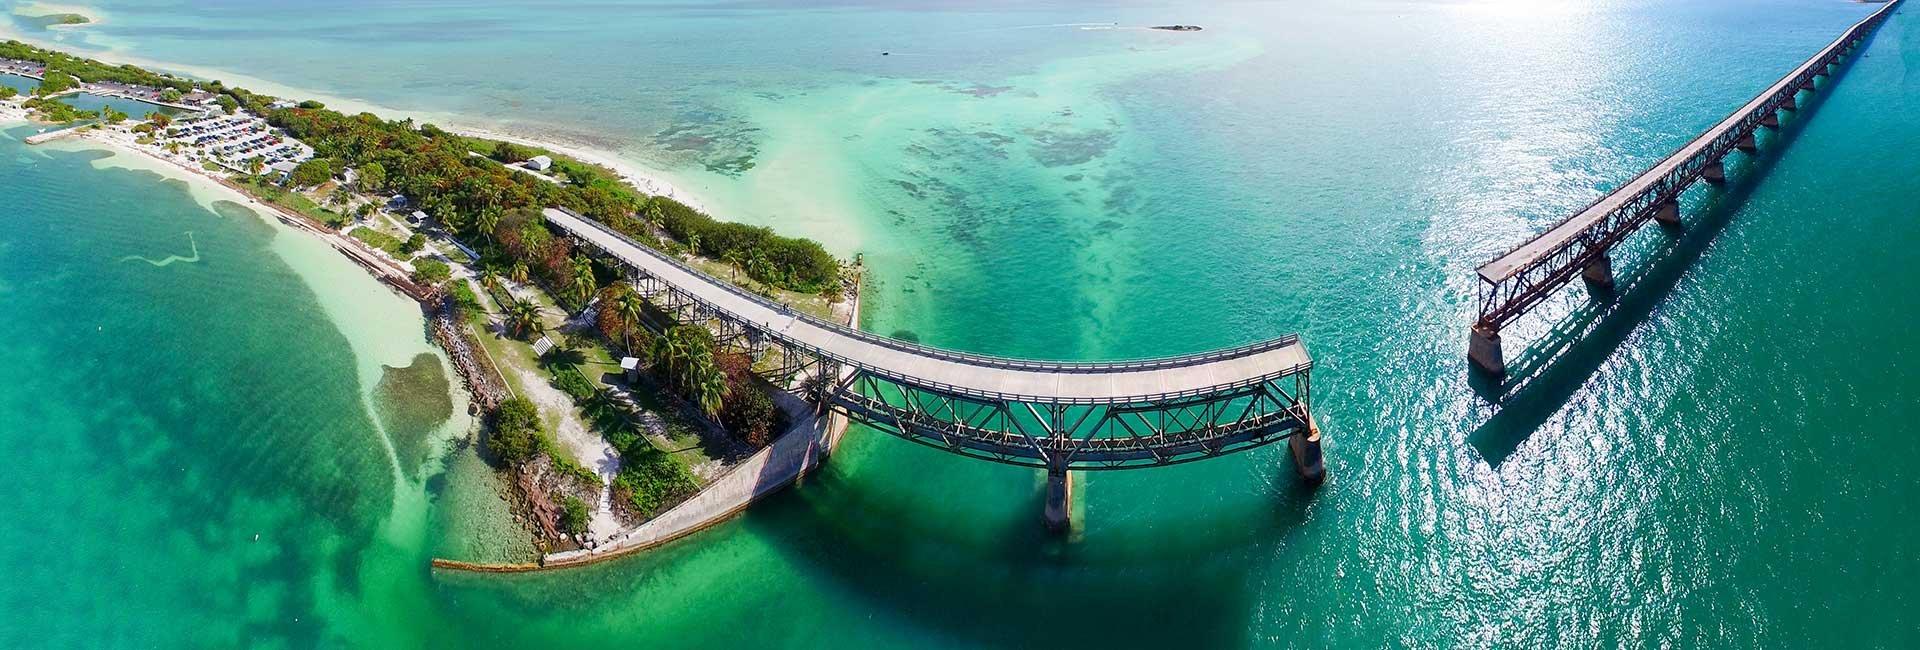 unfinished bridge in Key West